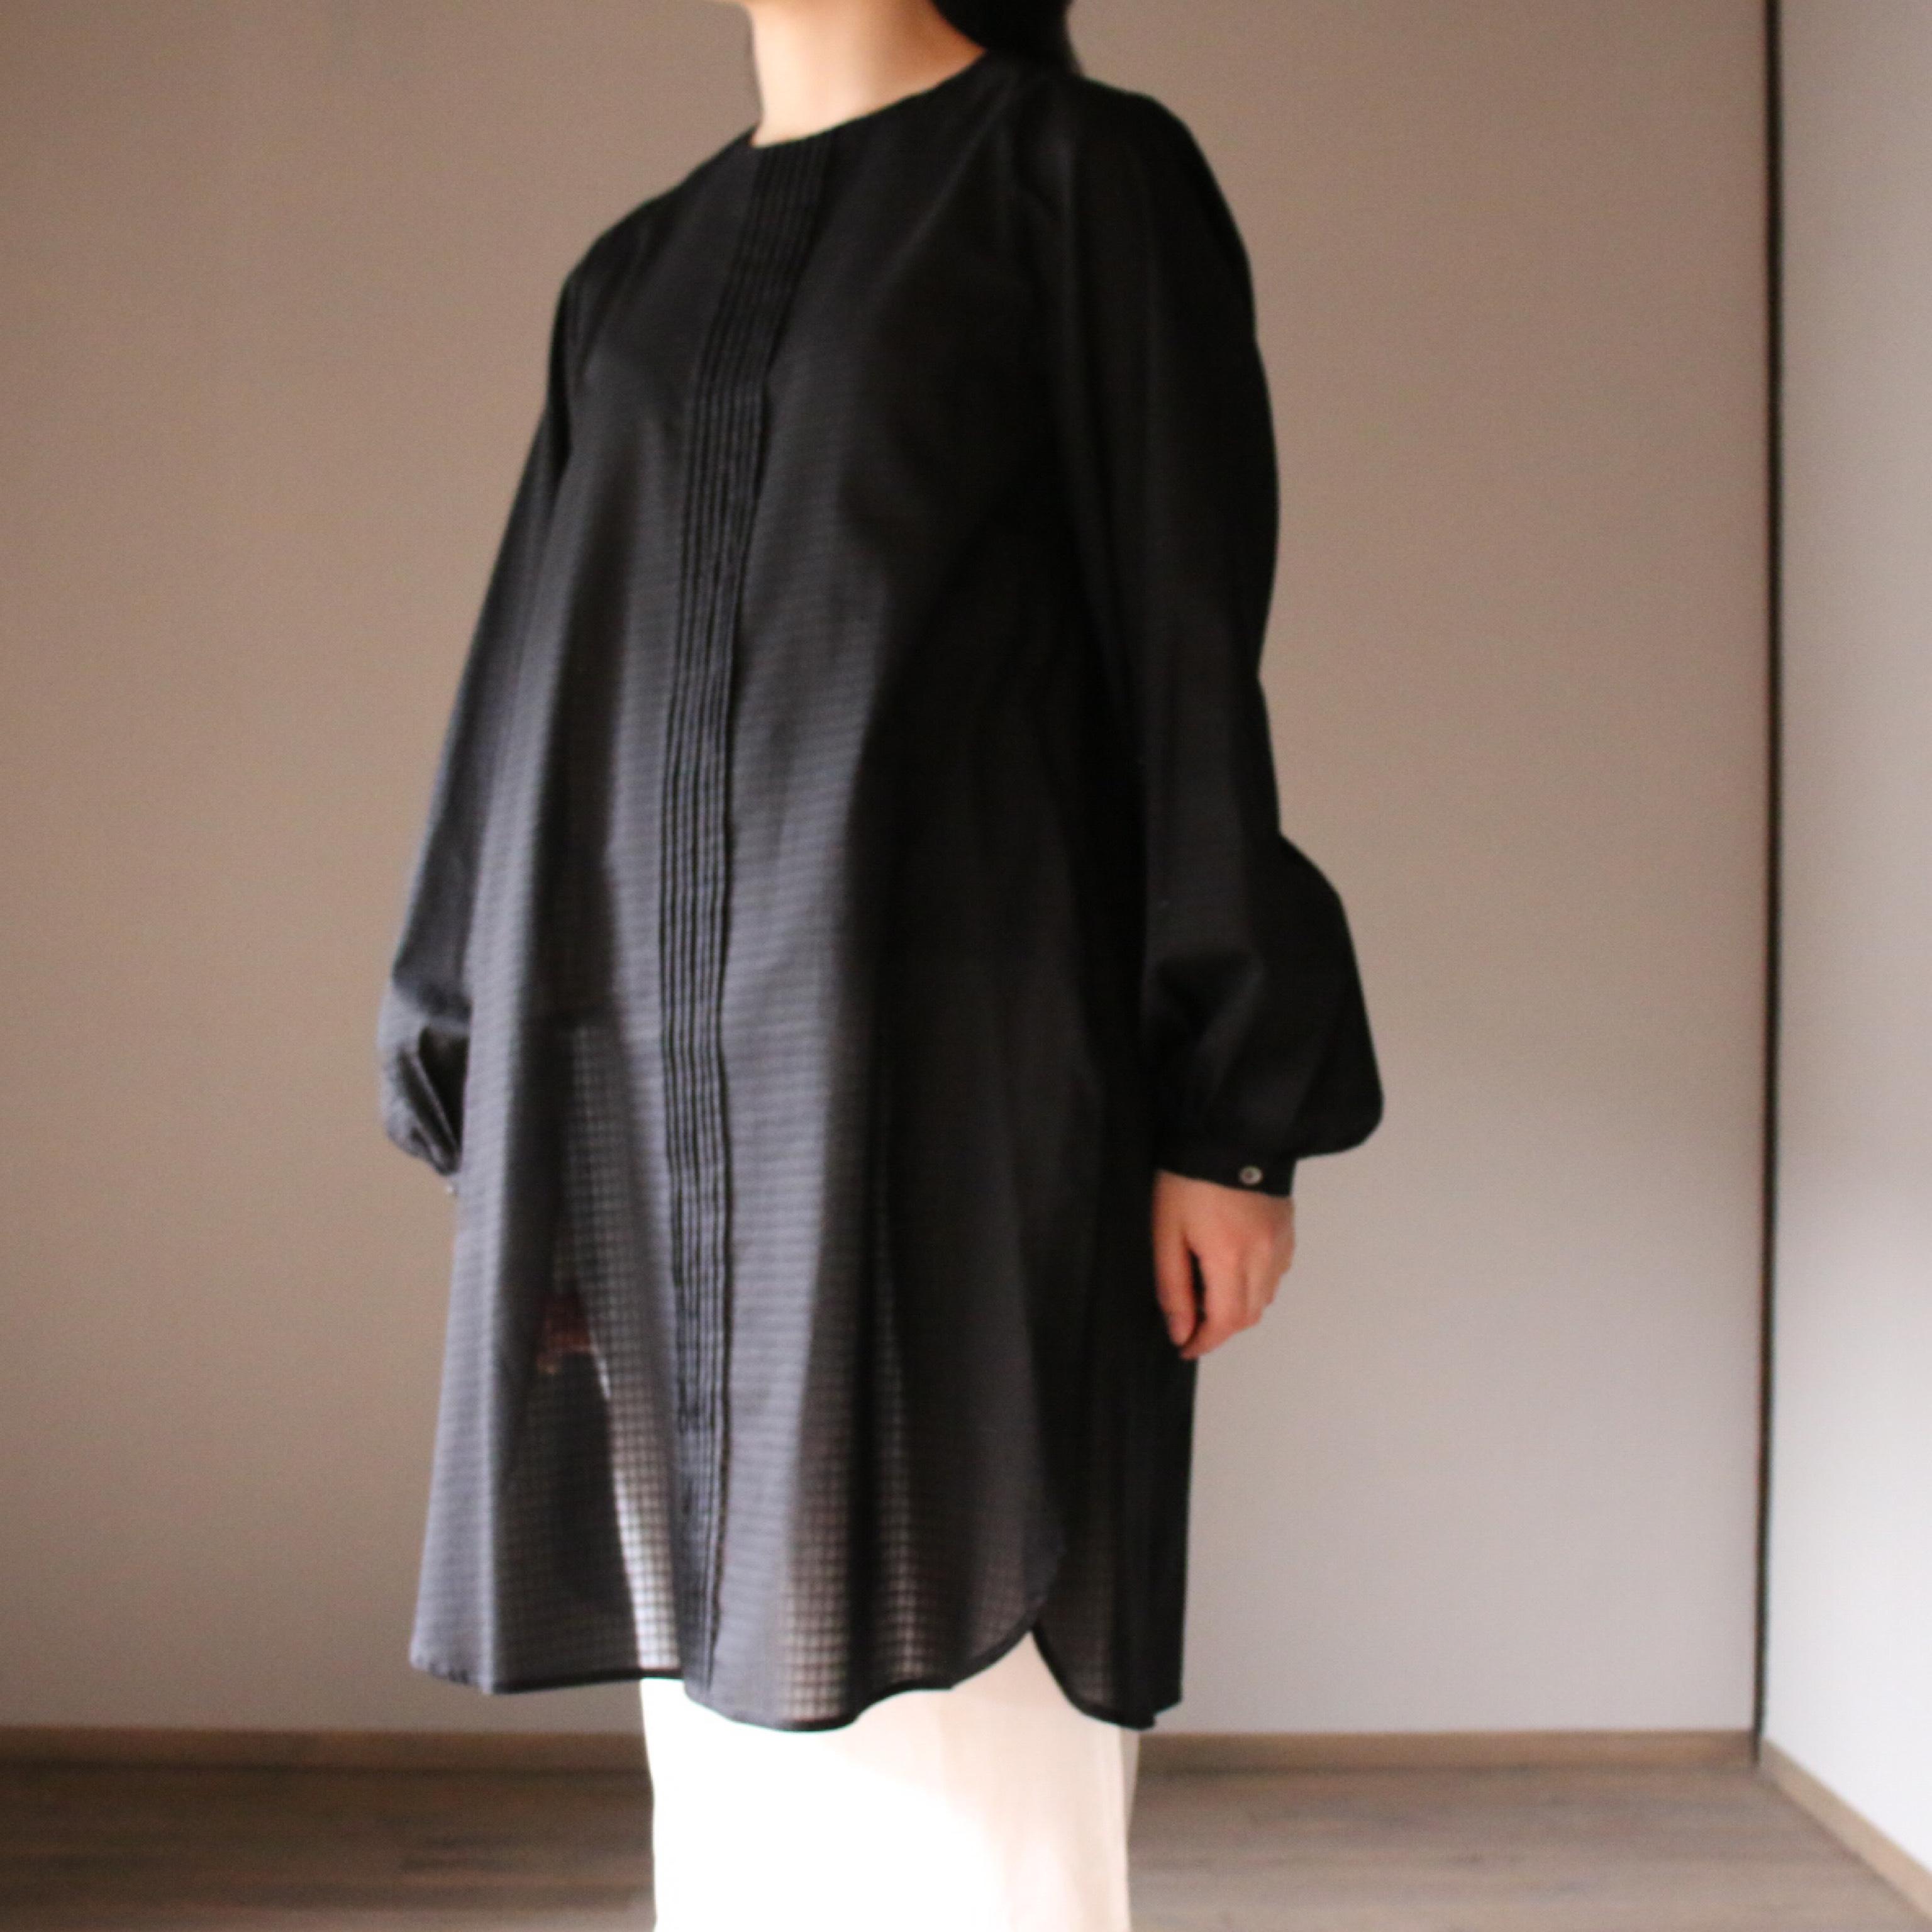 susuri/ススリ ラインブラウス BLACK #20-409